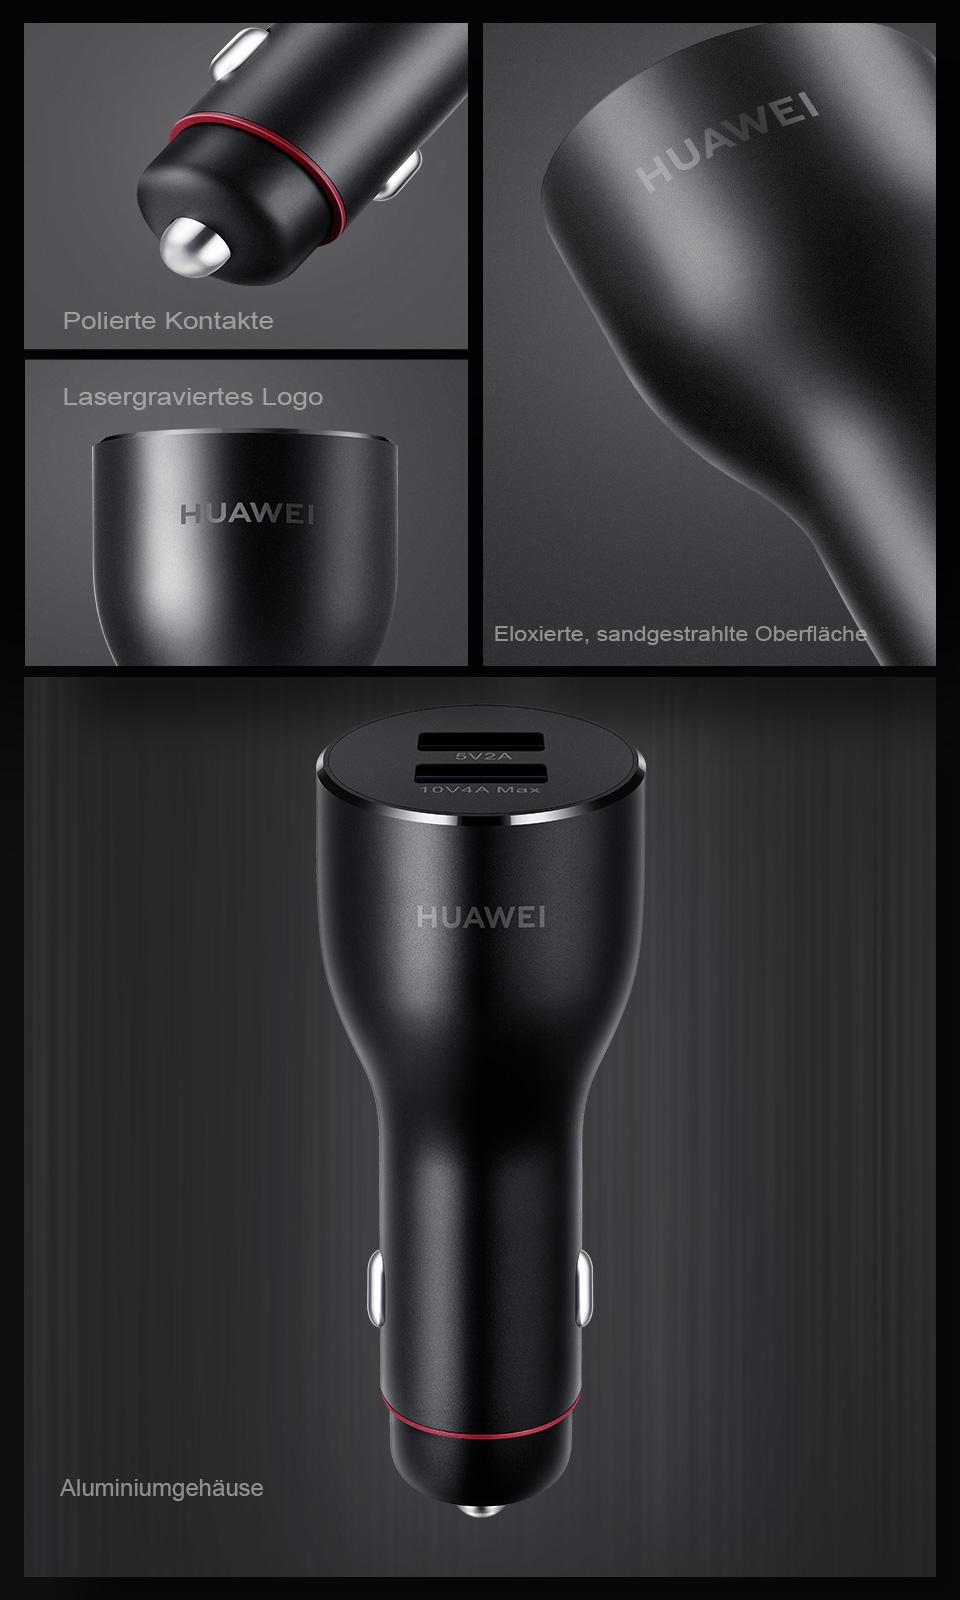 HUAWEI SuperCharge™ KFZ Ladegerät 2, KFZ Ladegerät mit zwei